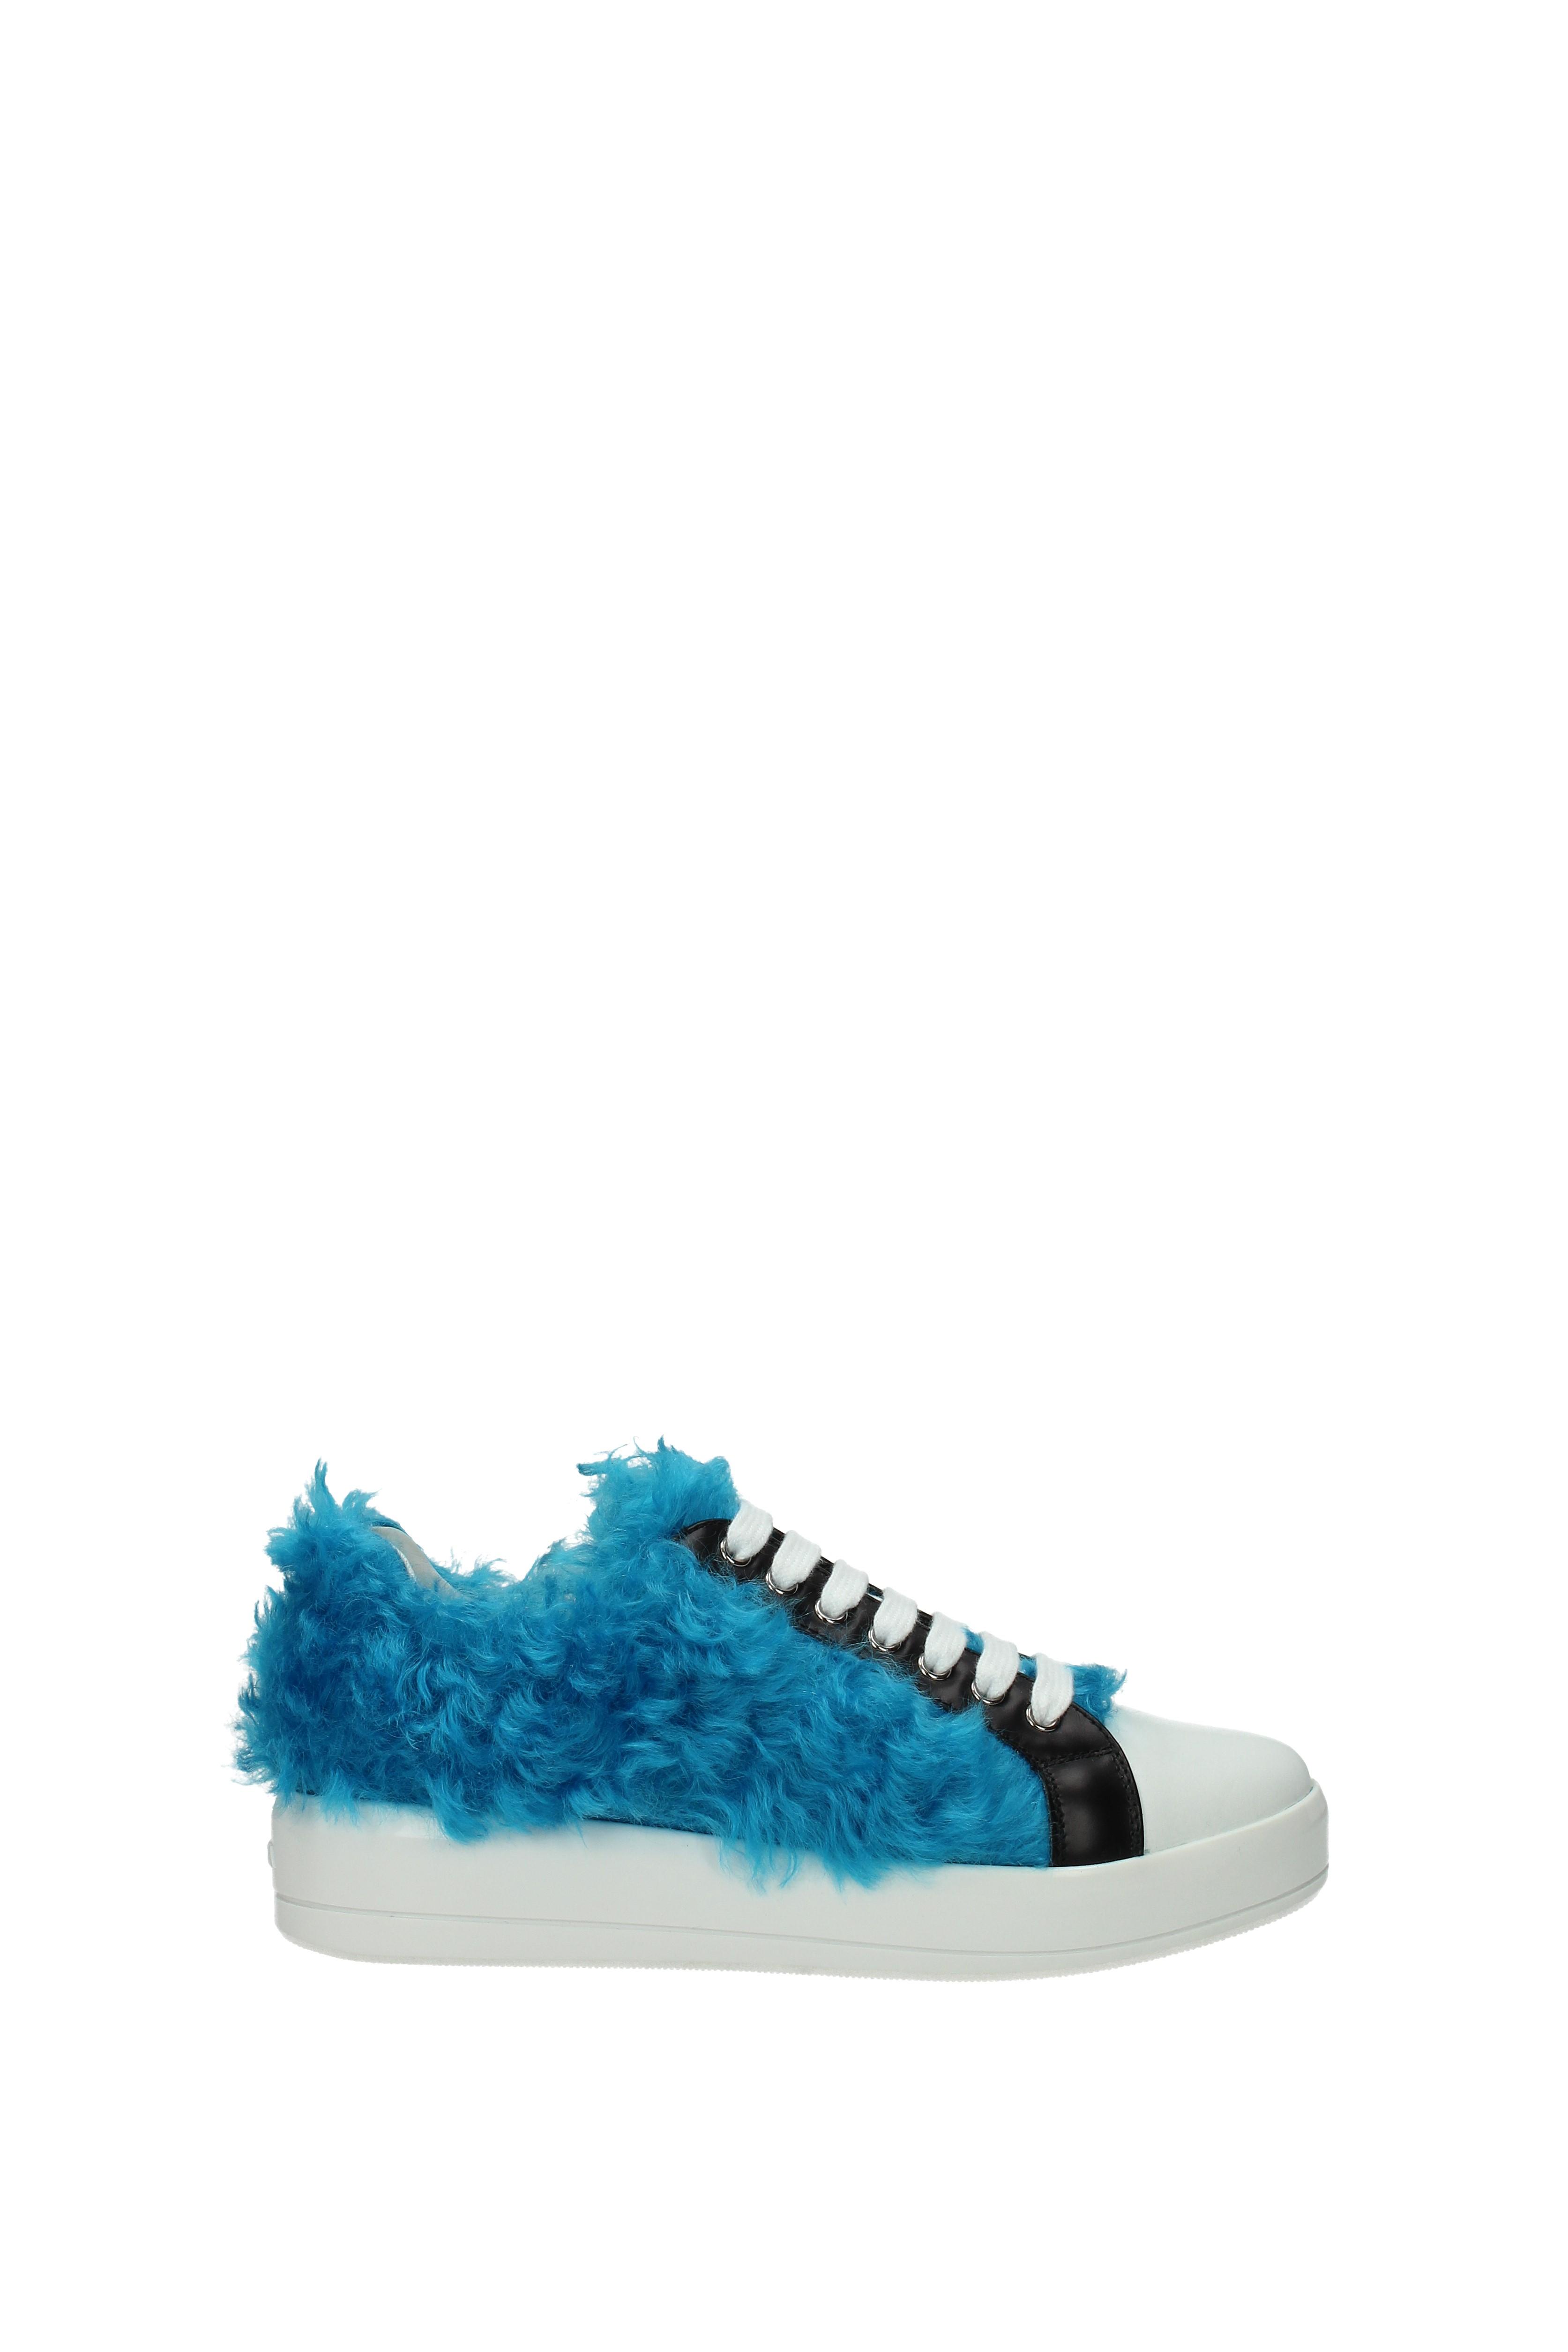 Sneakers Prada Damen Damen Damen - Eco Fell (3E6299) 3b6b2e